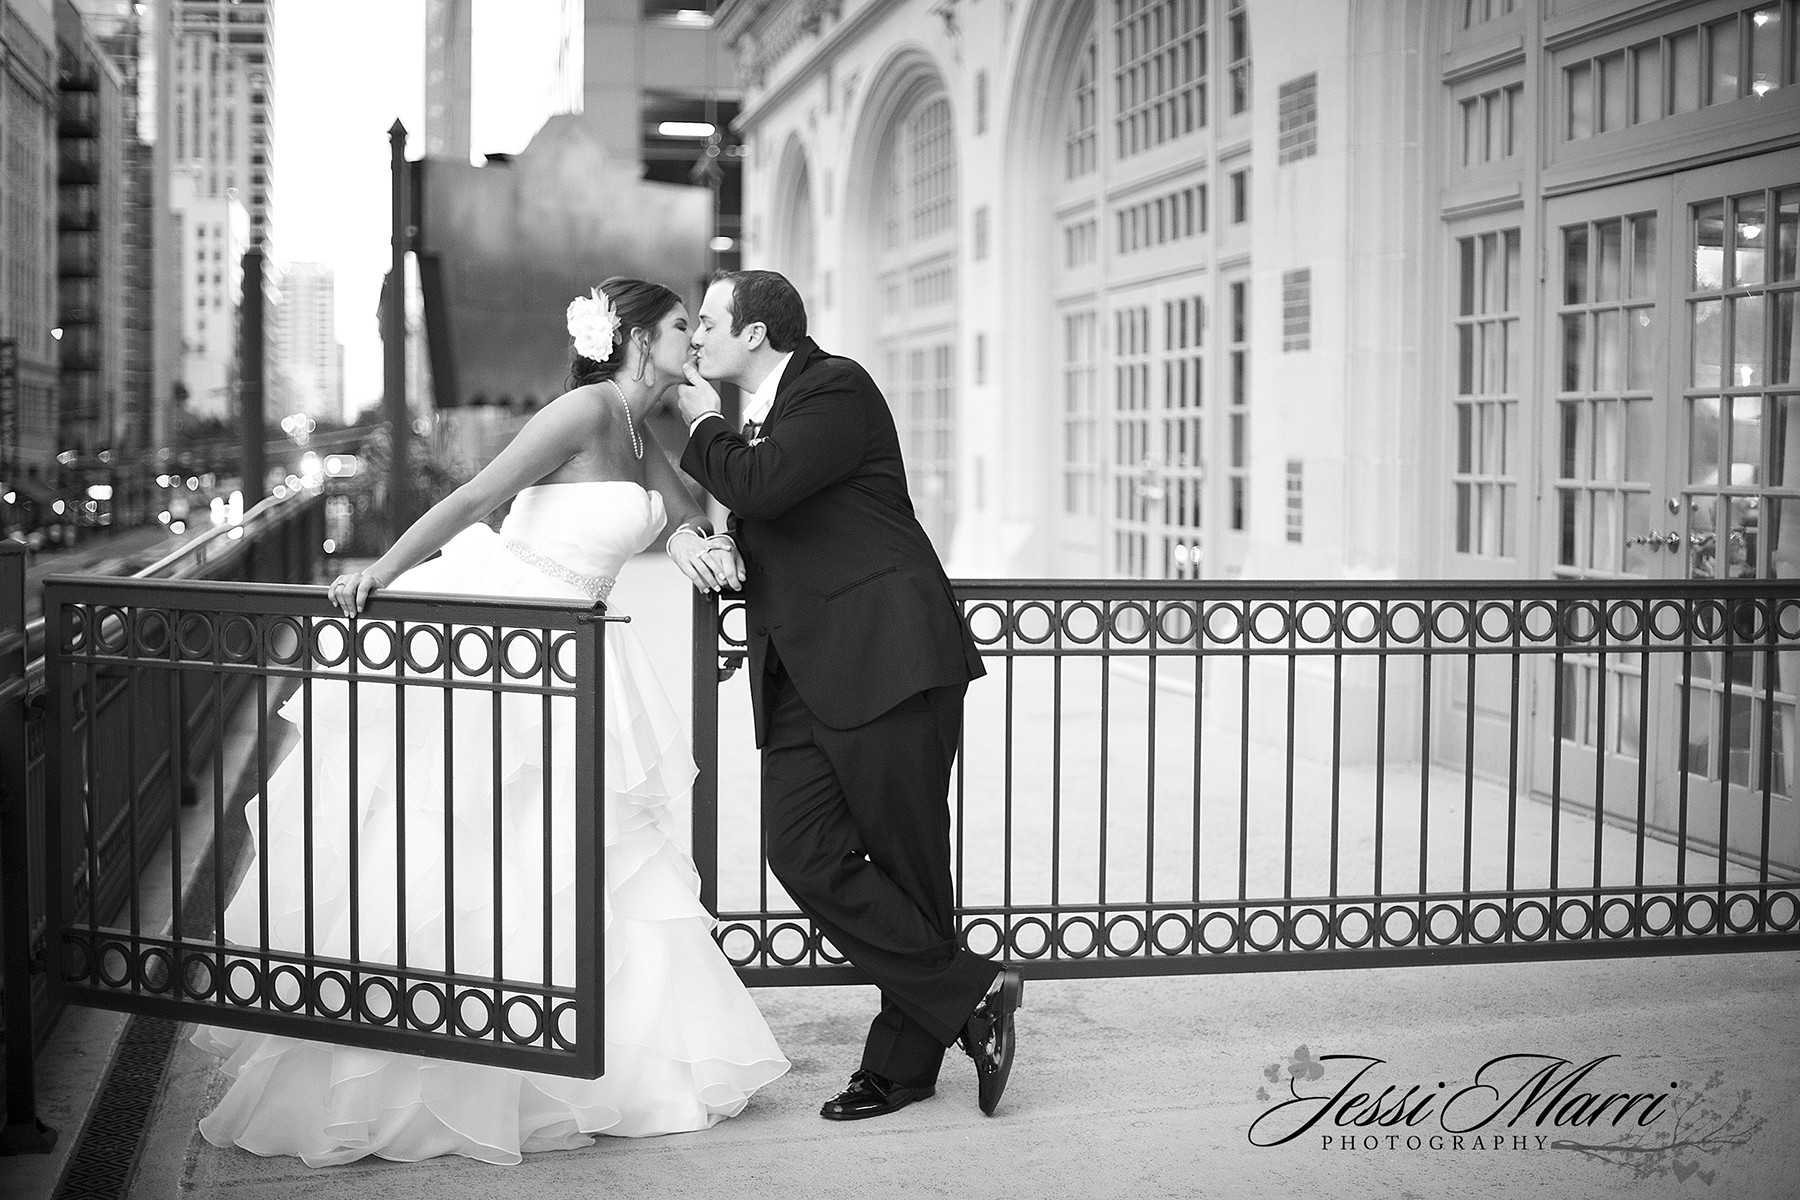 Houston Weddings at The Crystal Ballroom